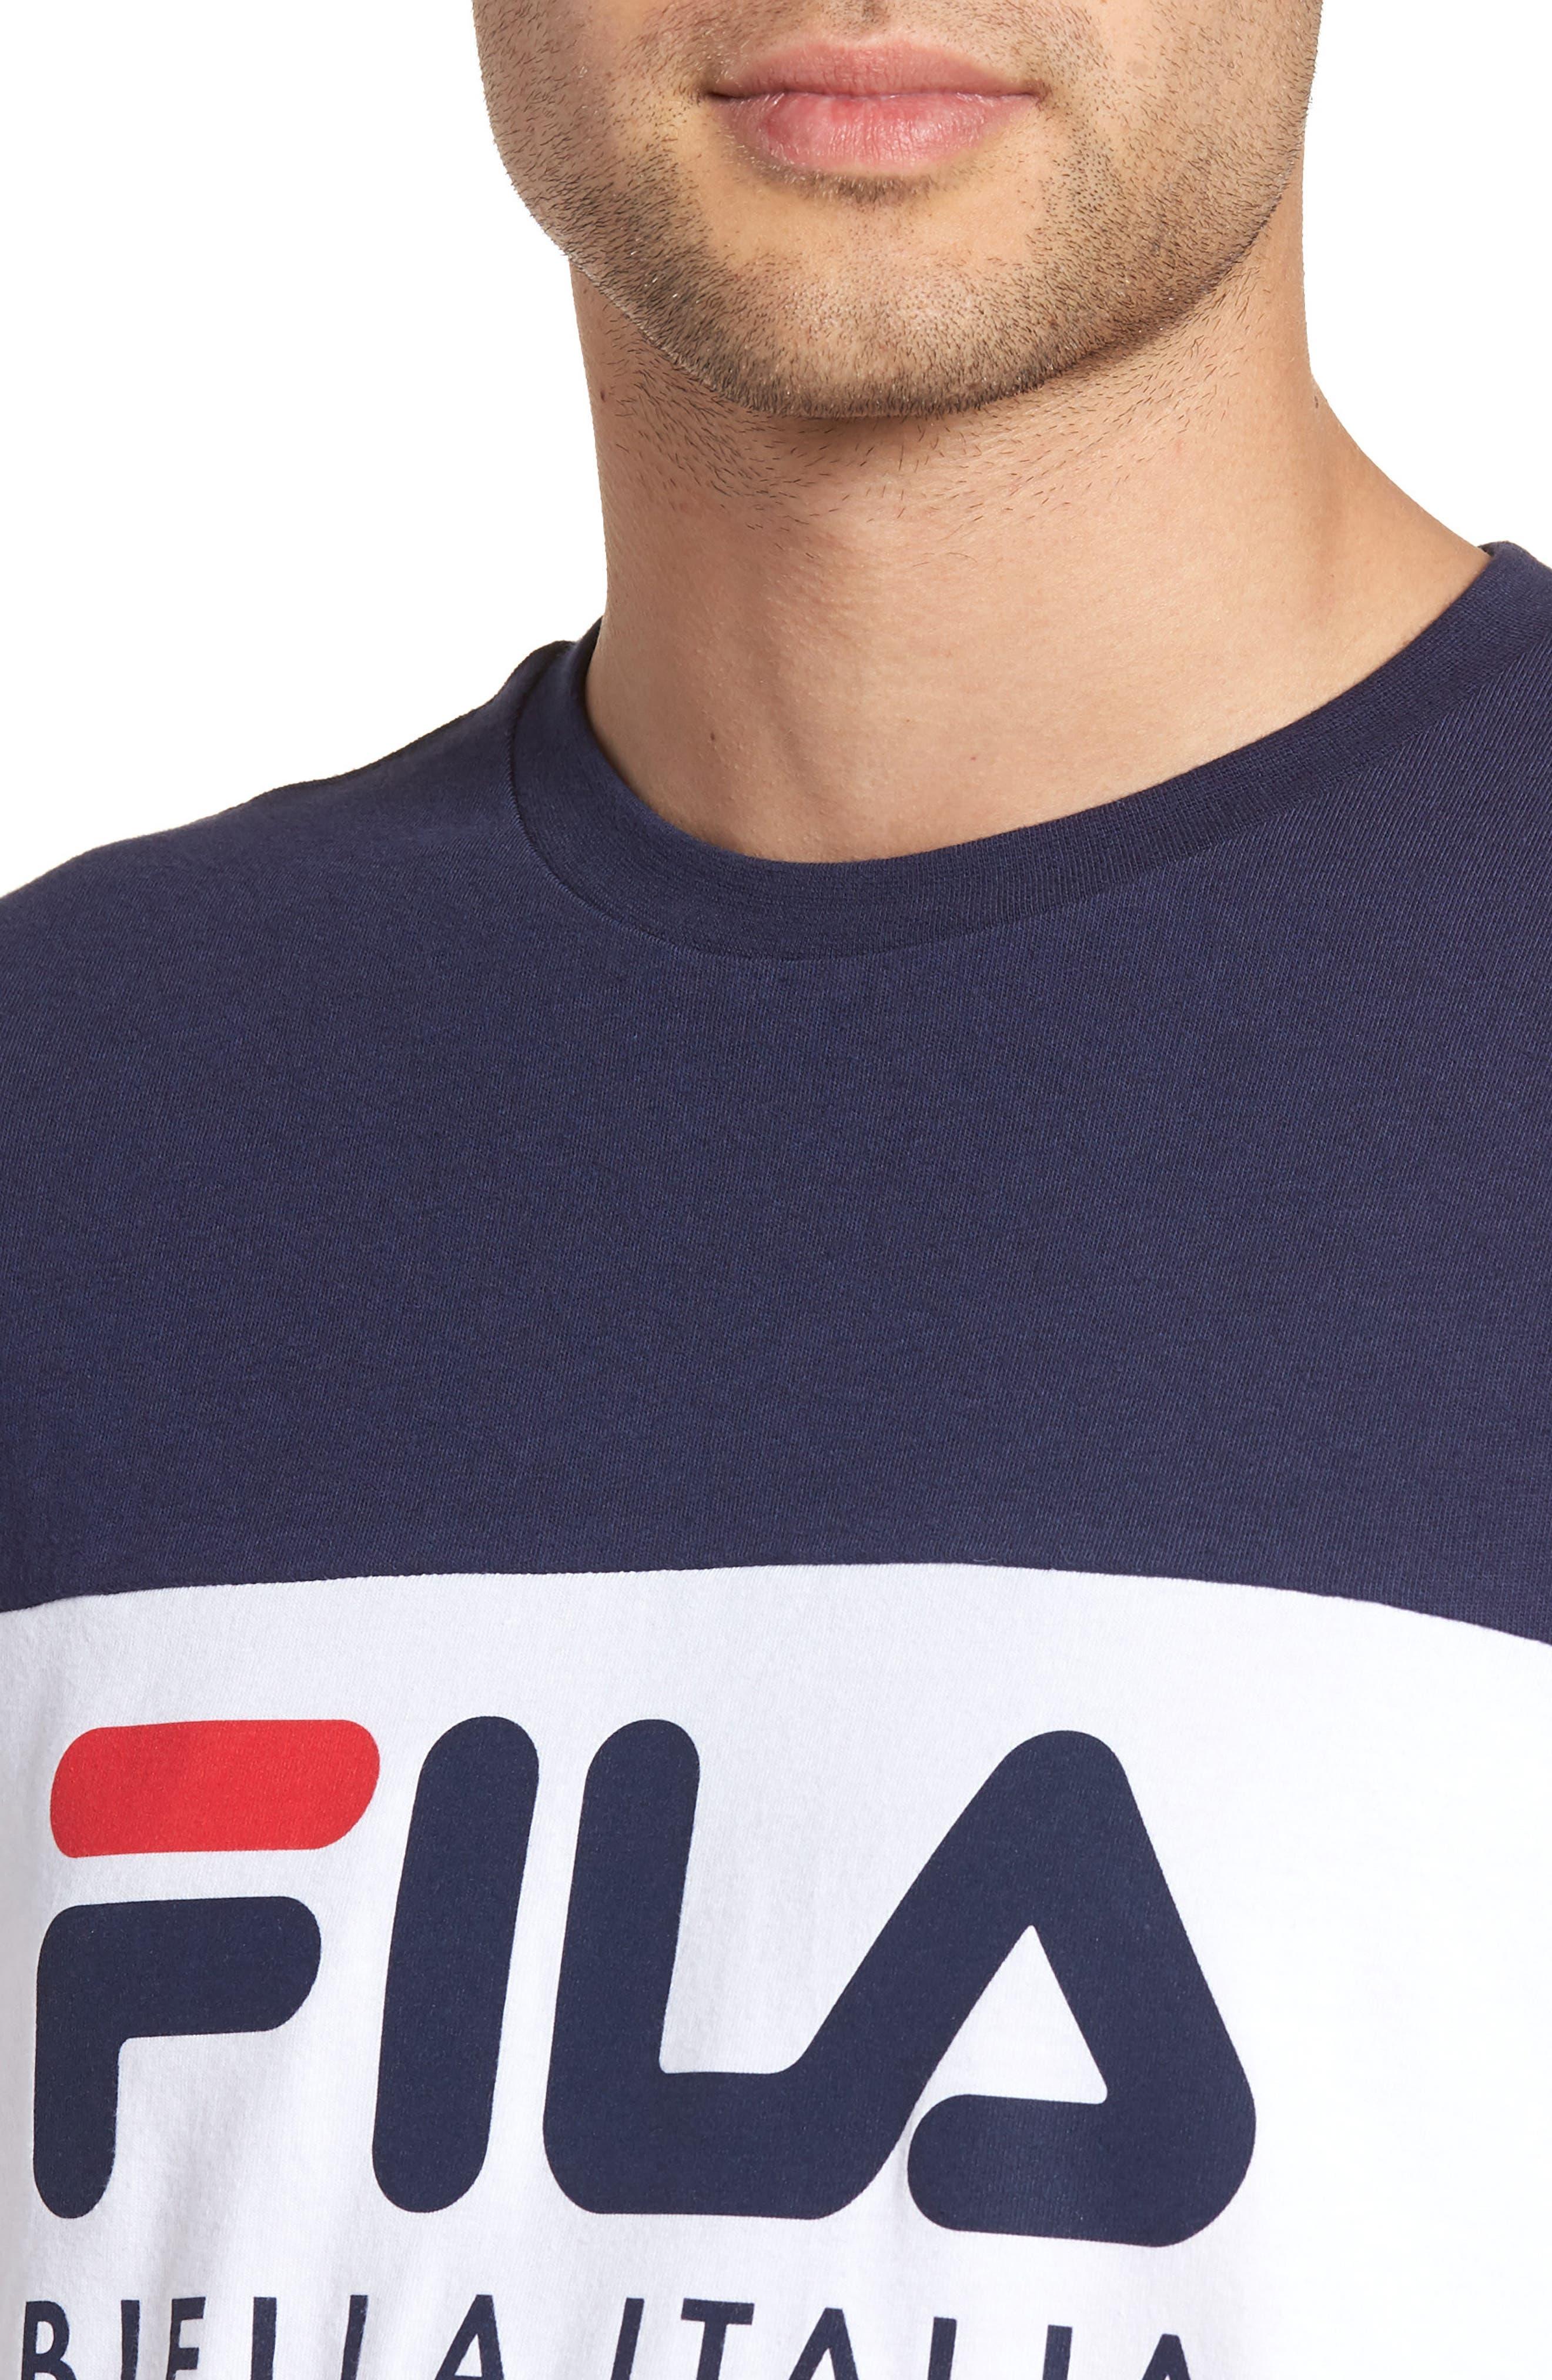 Biella Italia T-Shirt,                             Alternate thumbnail 4, color,                             Navy/ White/ Red